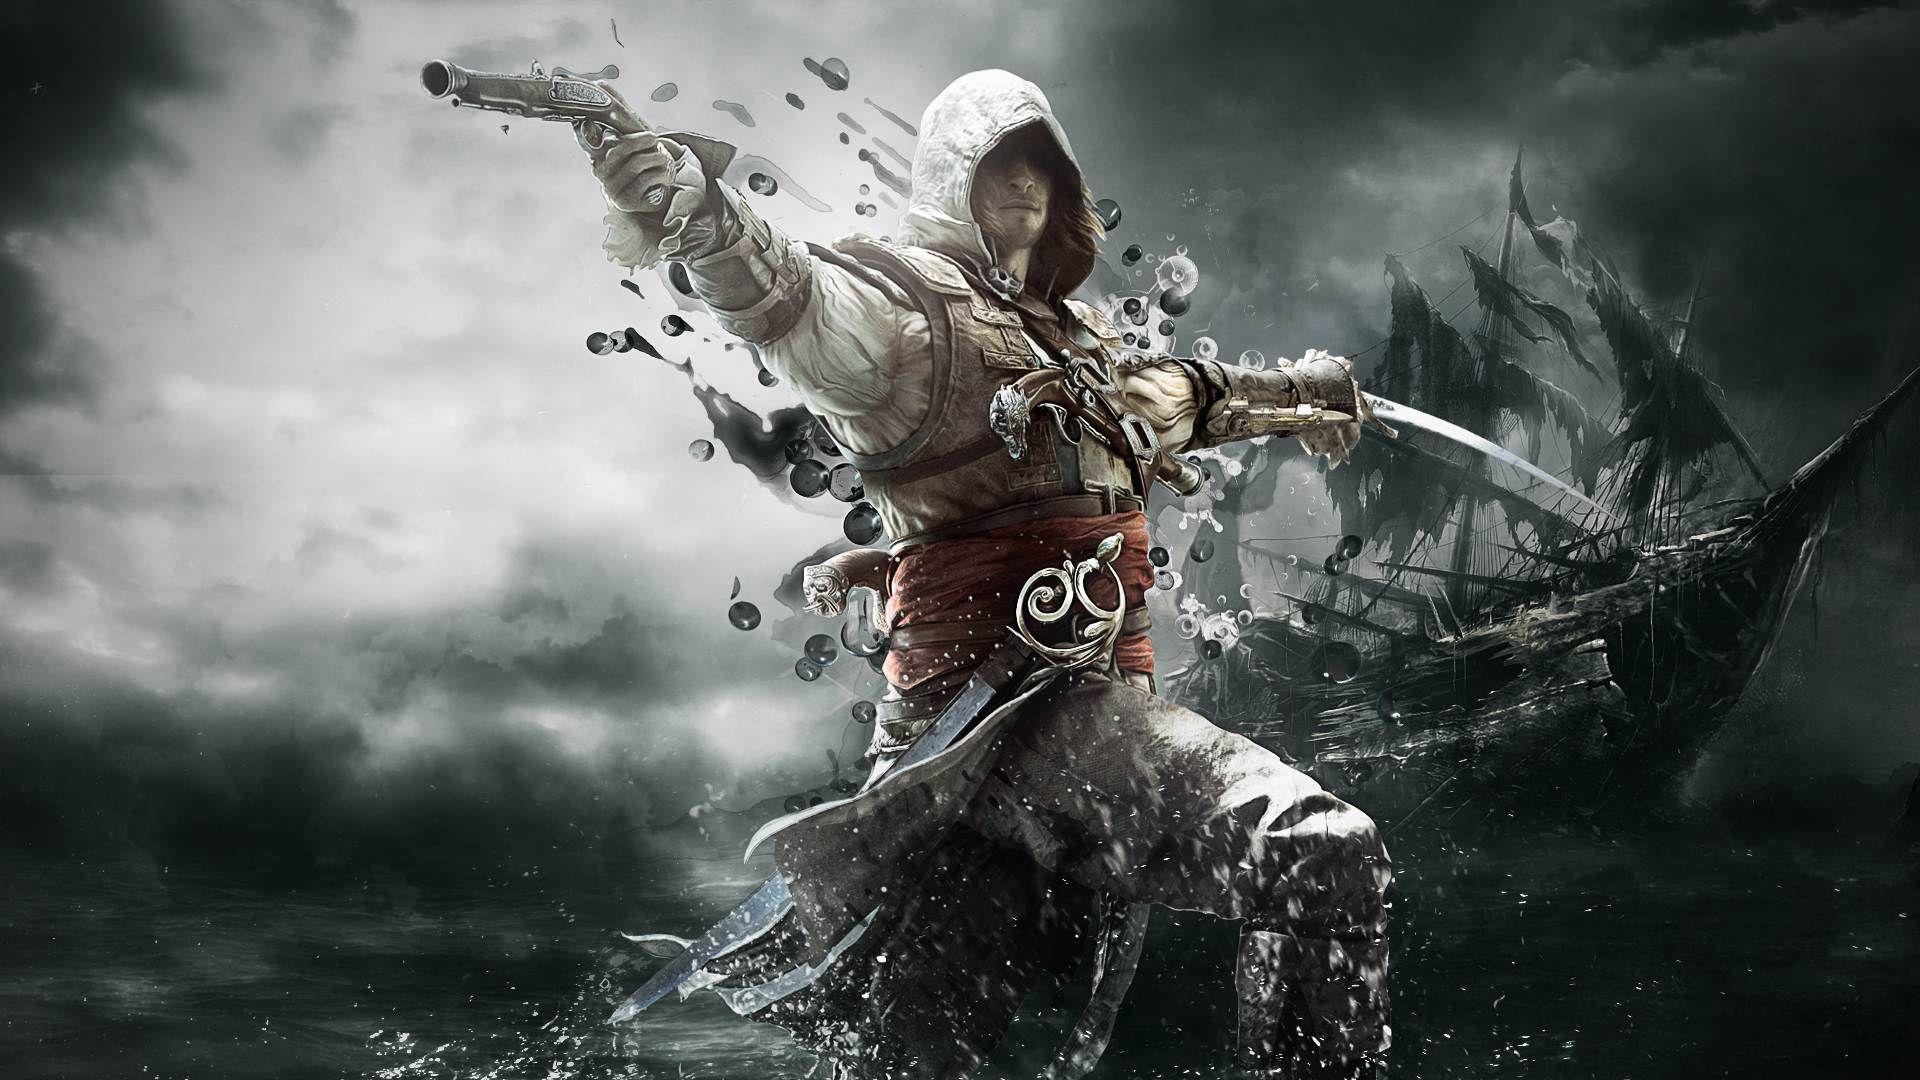 Assassins Creed Wallpapers Tema Assassin's Creed 4